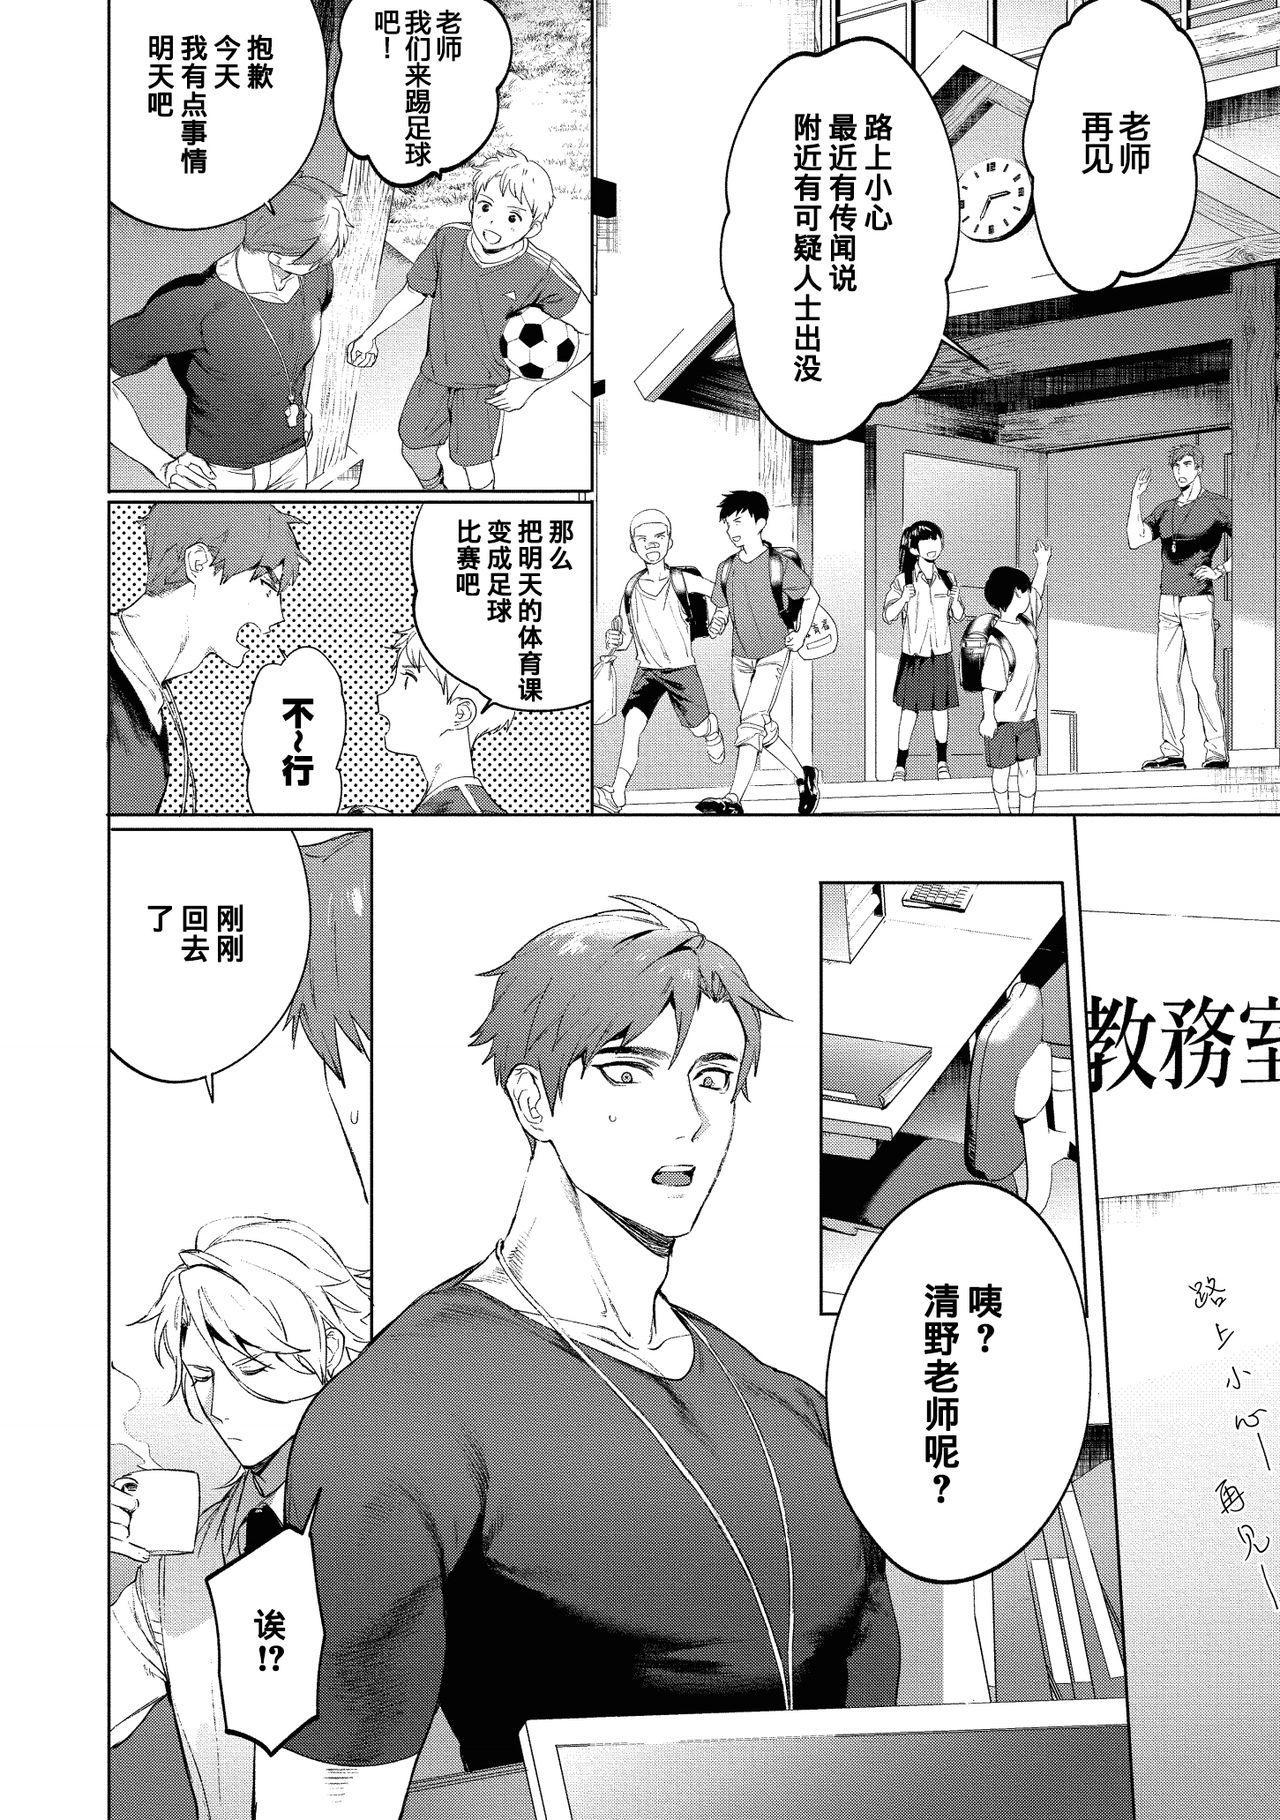 Sensei wa Benki ja Arimasen.3 | 老师不是便器。3 13